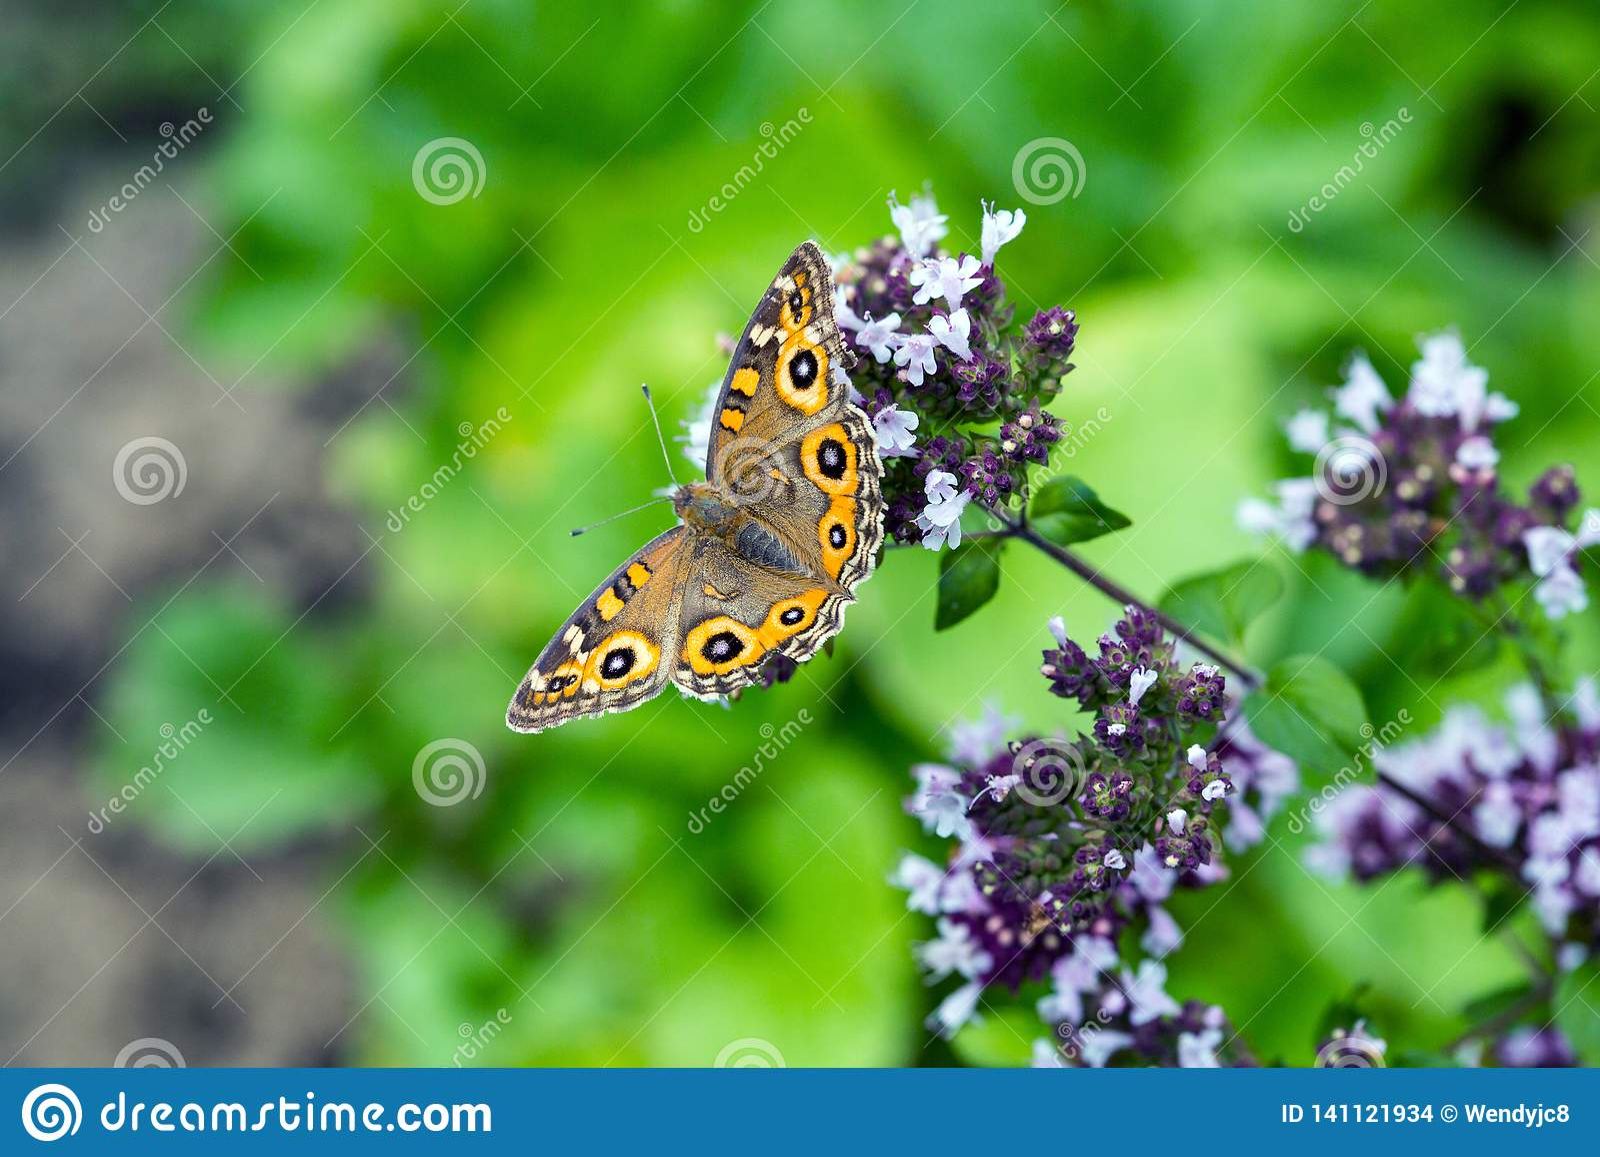 De Vlinder van weideargus op bloeiende orego